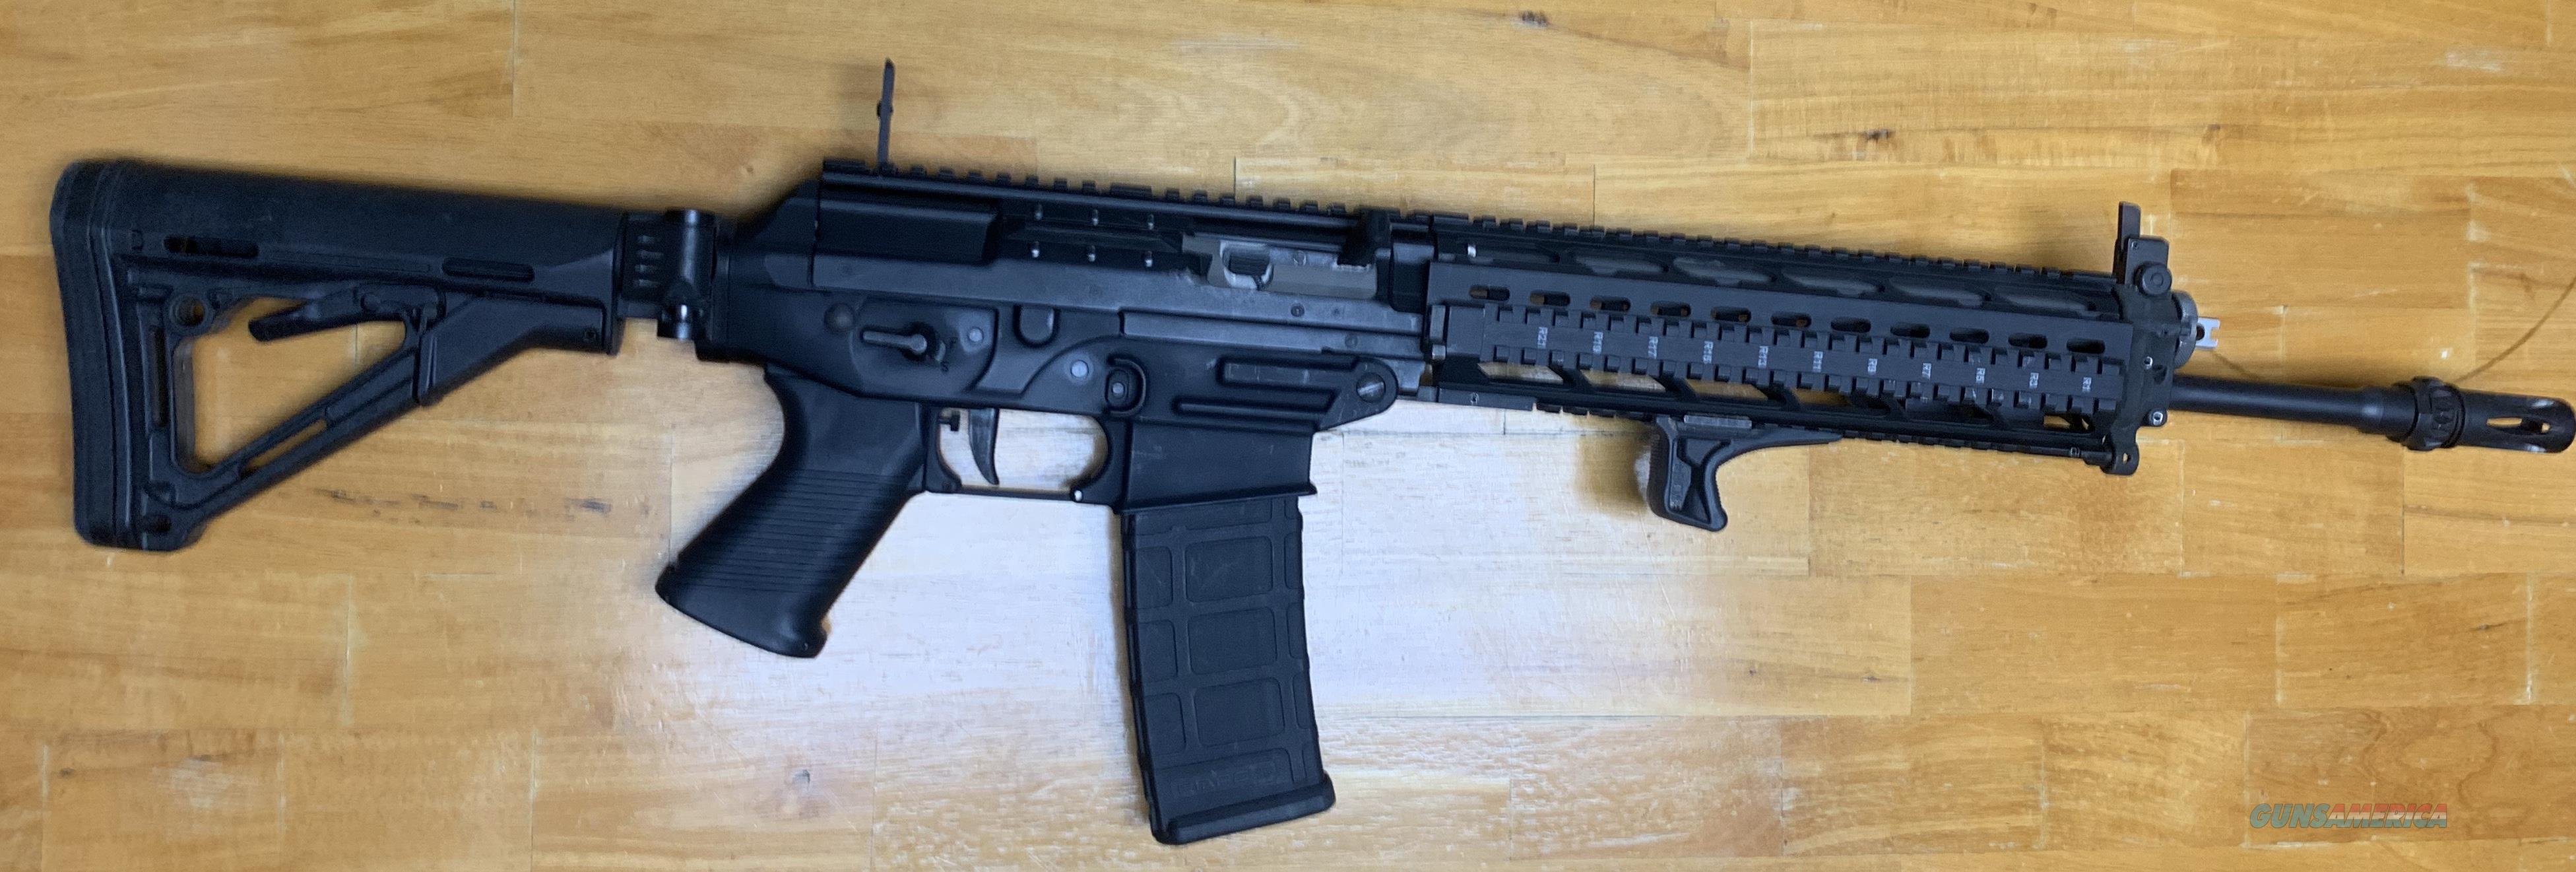 sig 556 swat classic  Guns > Rifles > Sig - Sauer/Sigarms Rifles